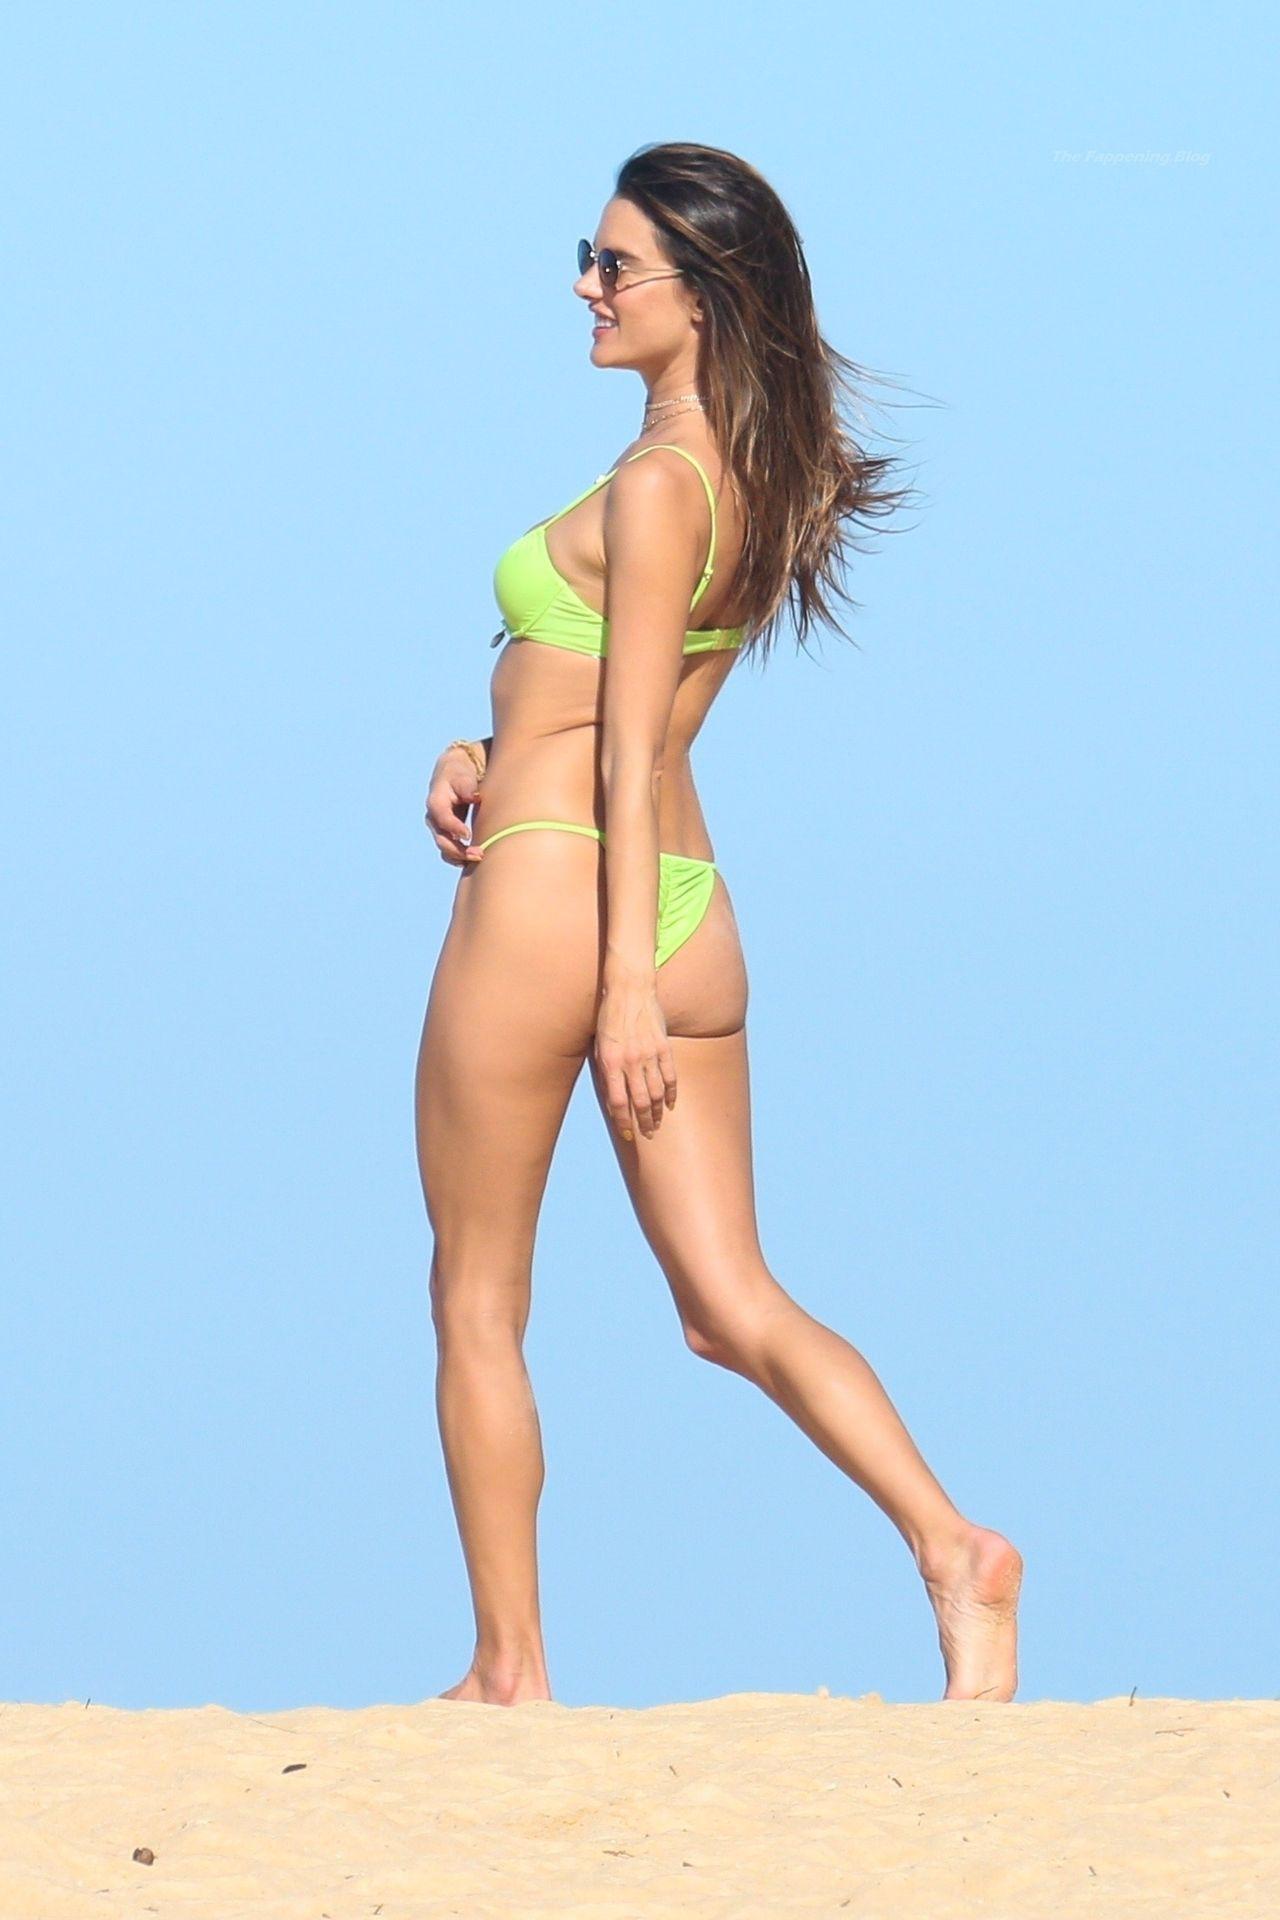 Alessandra-Ambrosio-Sexy-The-Fappening-Blog-1001.jpg